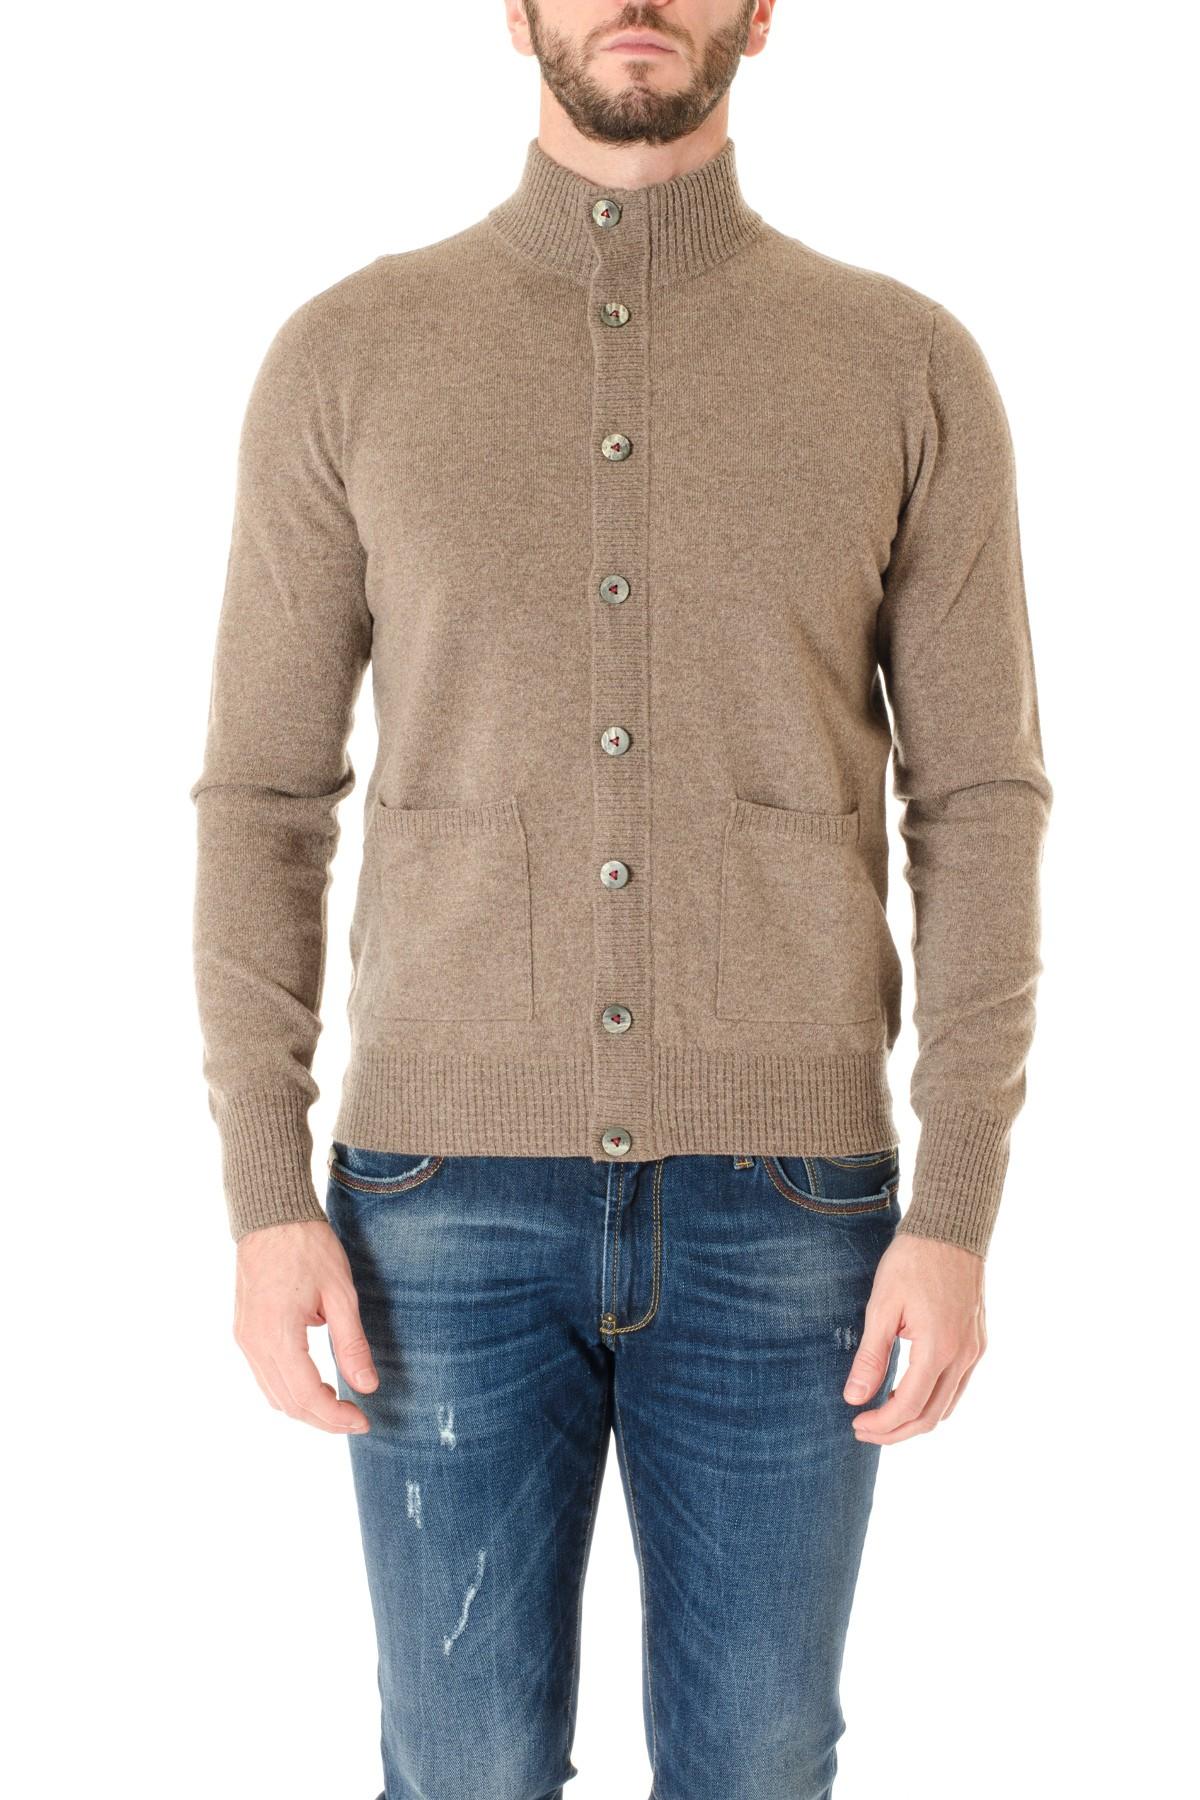 aecd5e0150e Brown cardigan sweater for men H953 F/W 16-17